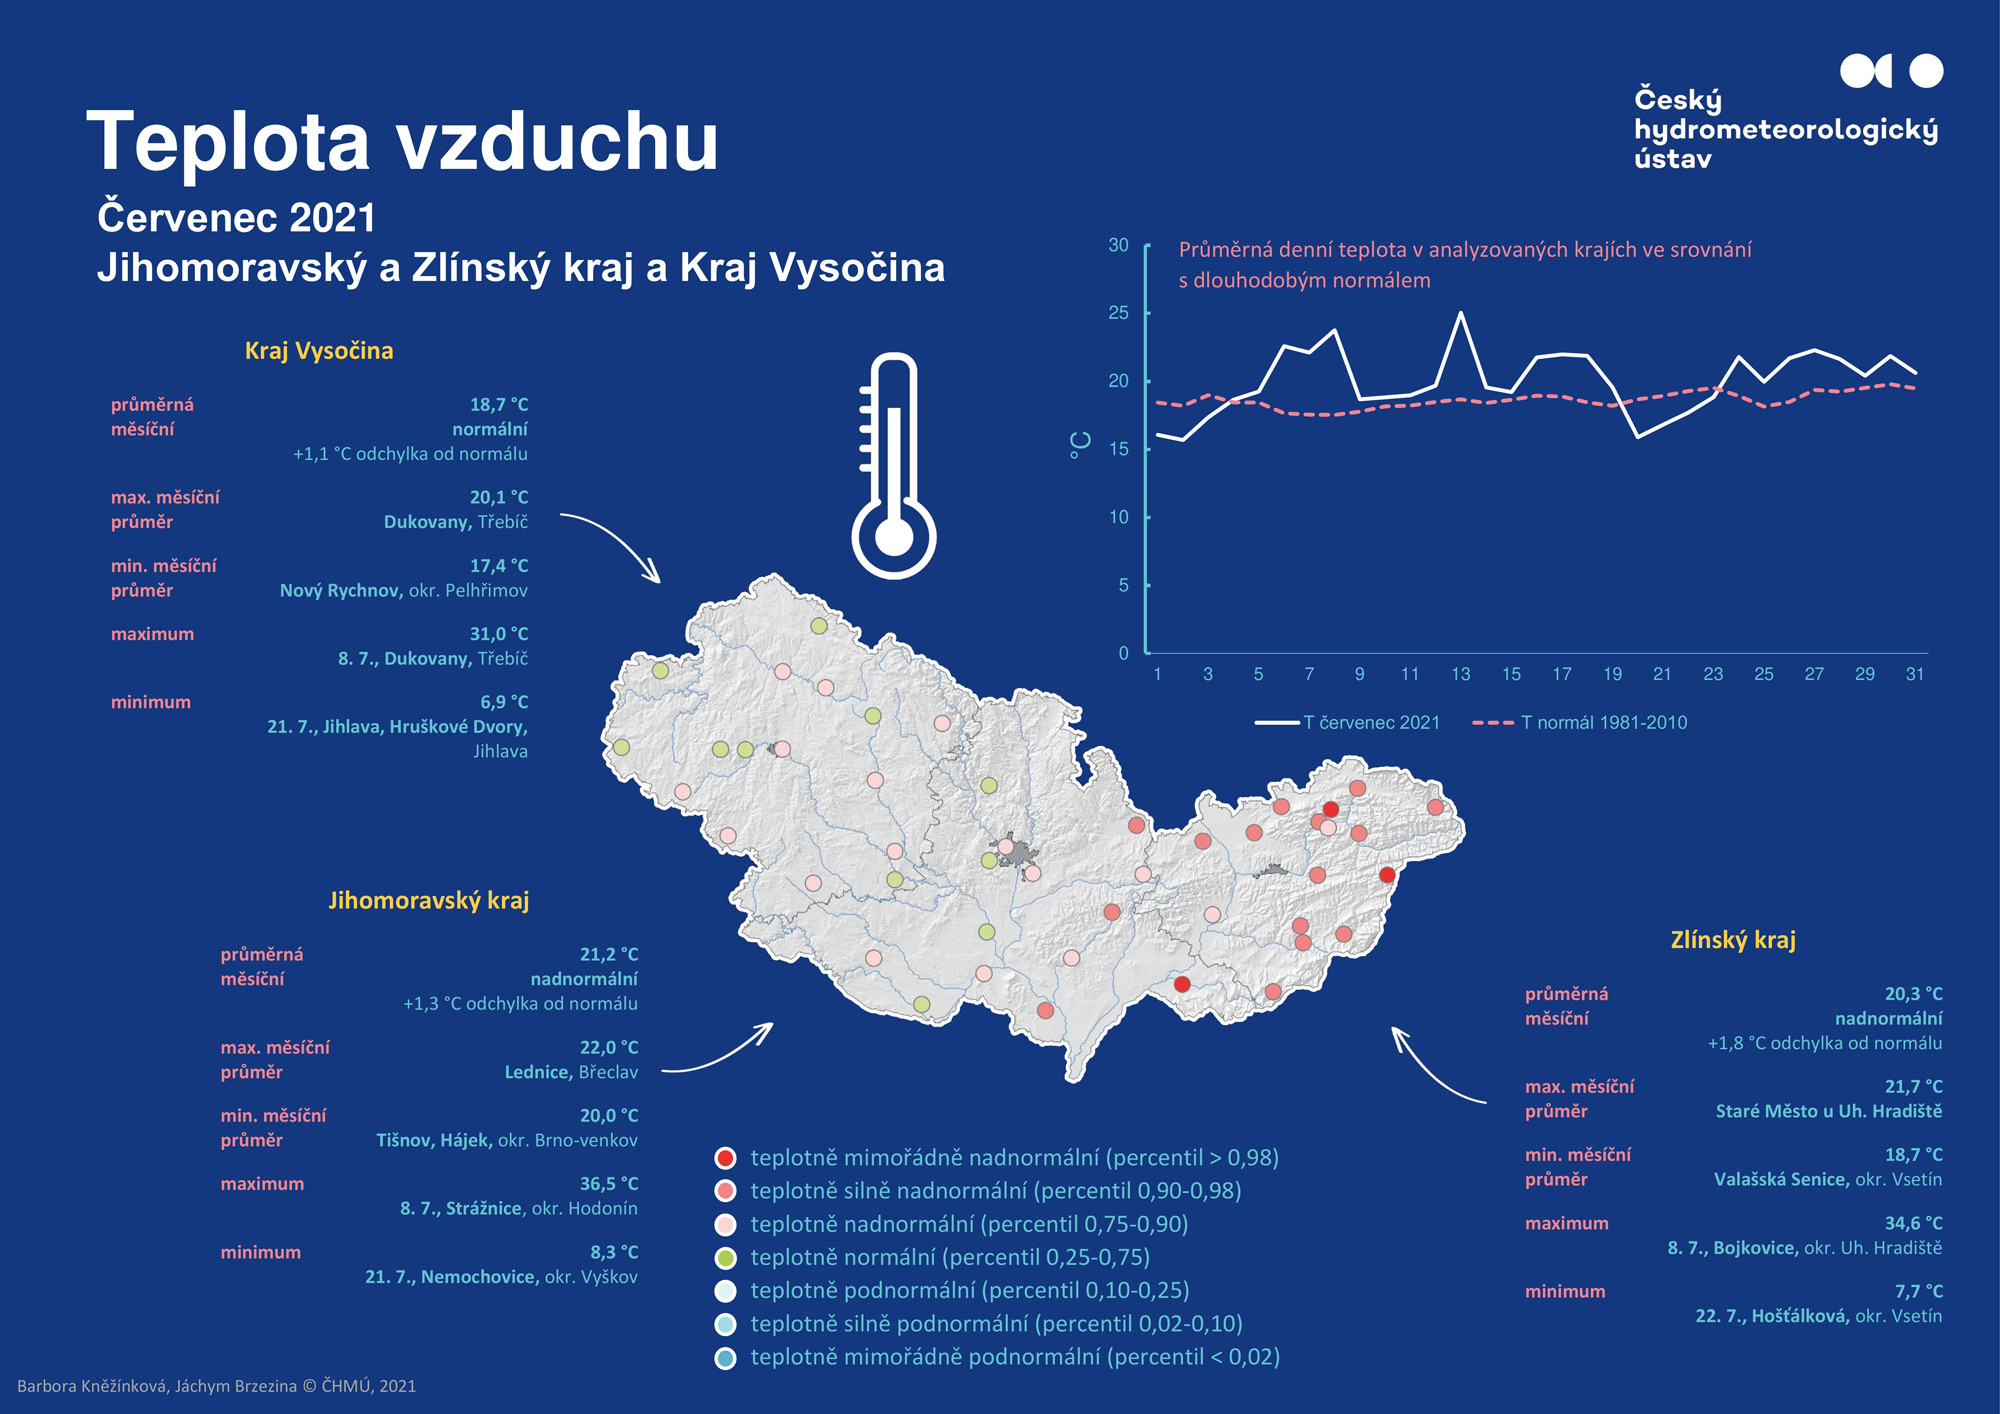 Teplota vzduchu v červenci 2021 – Jihomoravský kraj, Zlínský kraj a Kraj Vysočina1 min čtení